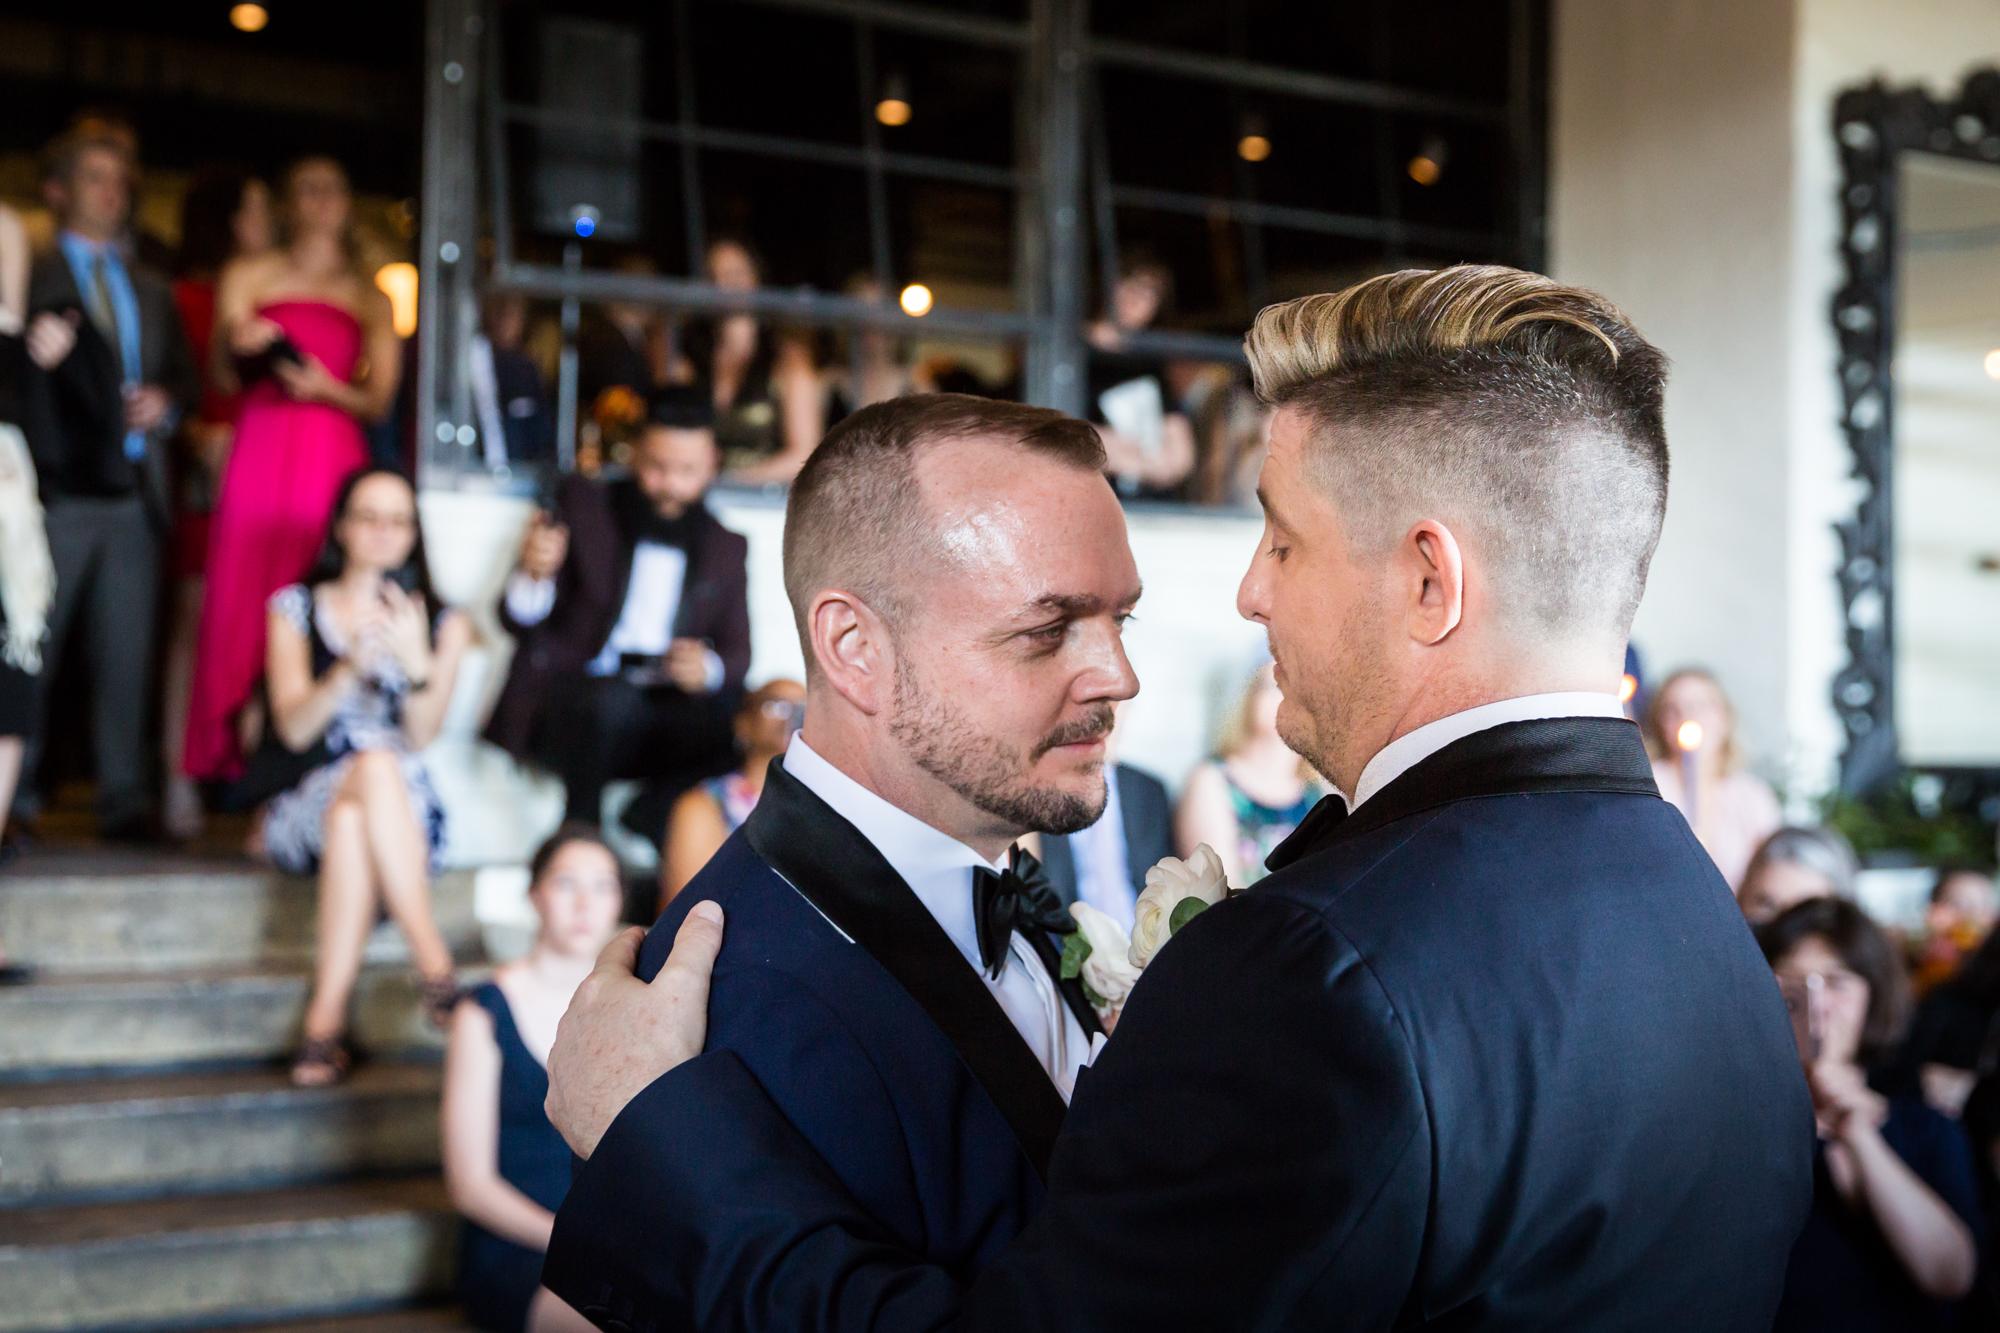 First dance at a same sex wedding celebration in Washington DC